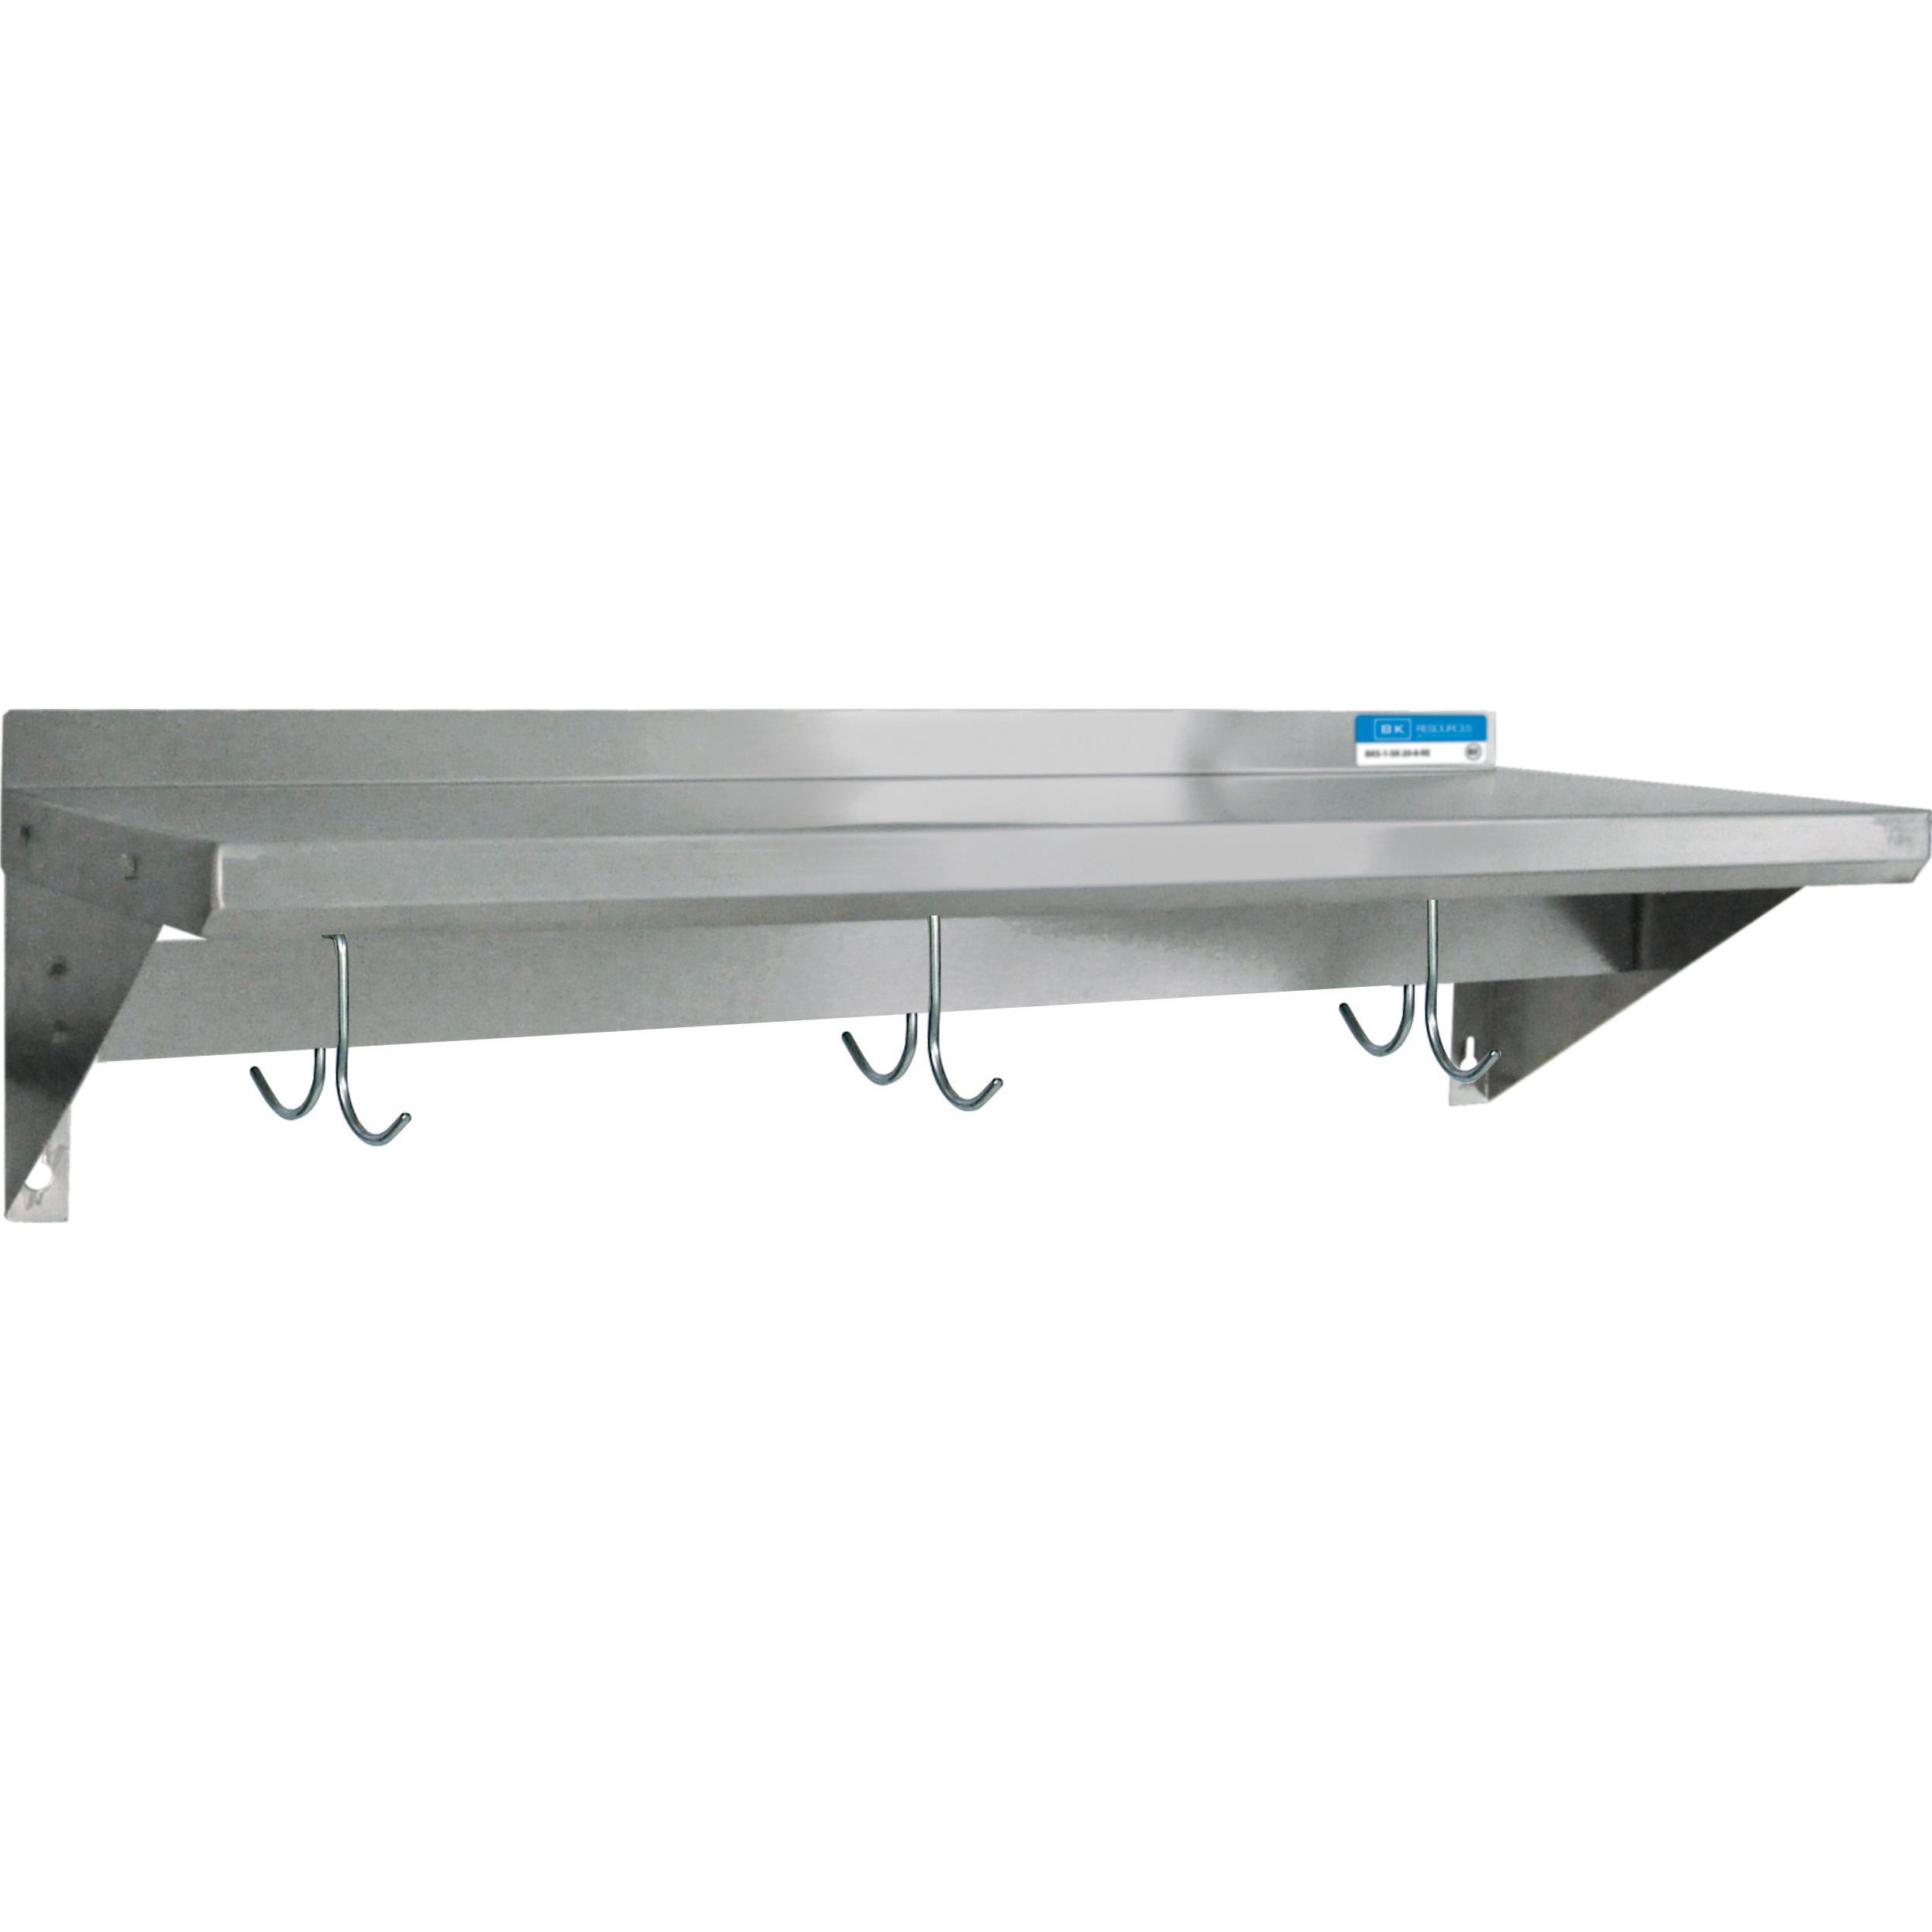 BK Resources BKWS6-1448-PR overshelf, wall-mounted with pot rack